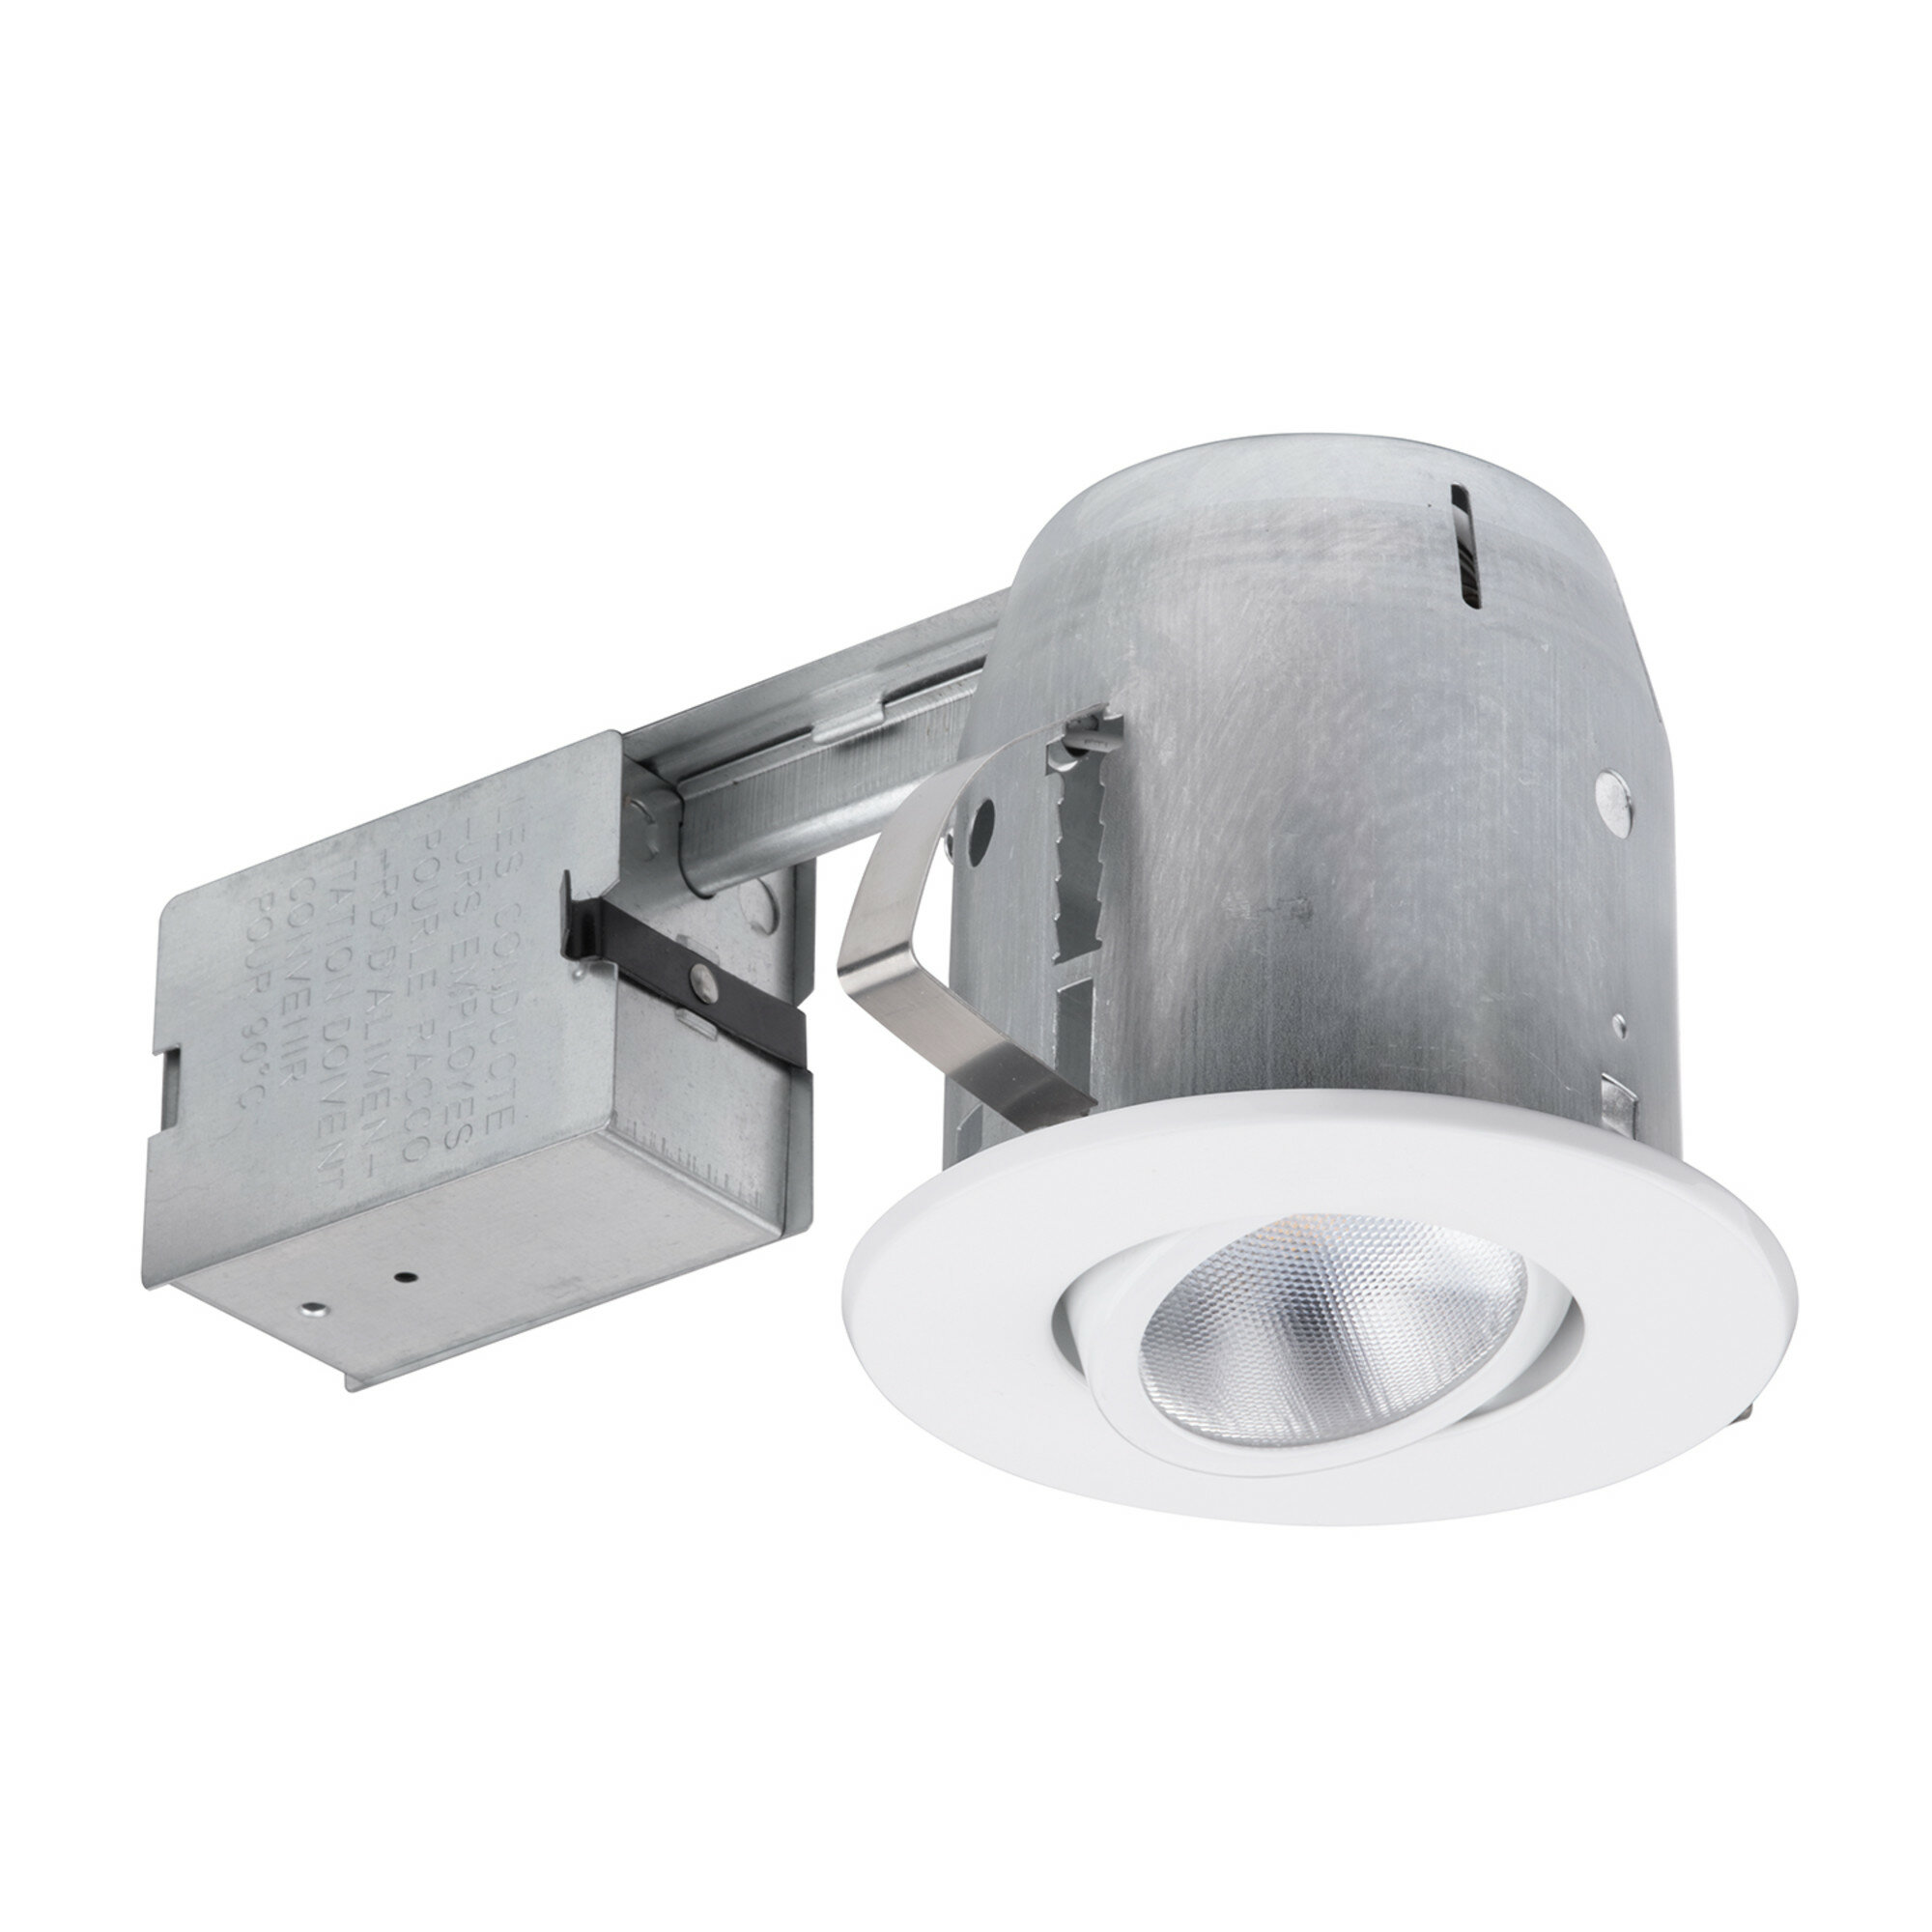 Swivel Round Trim 4 Recessed Lighting Kit